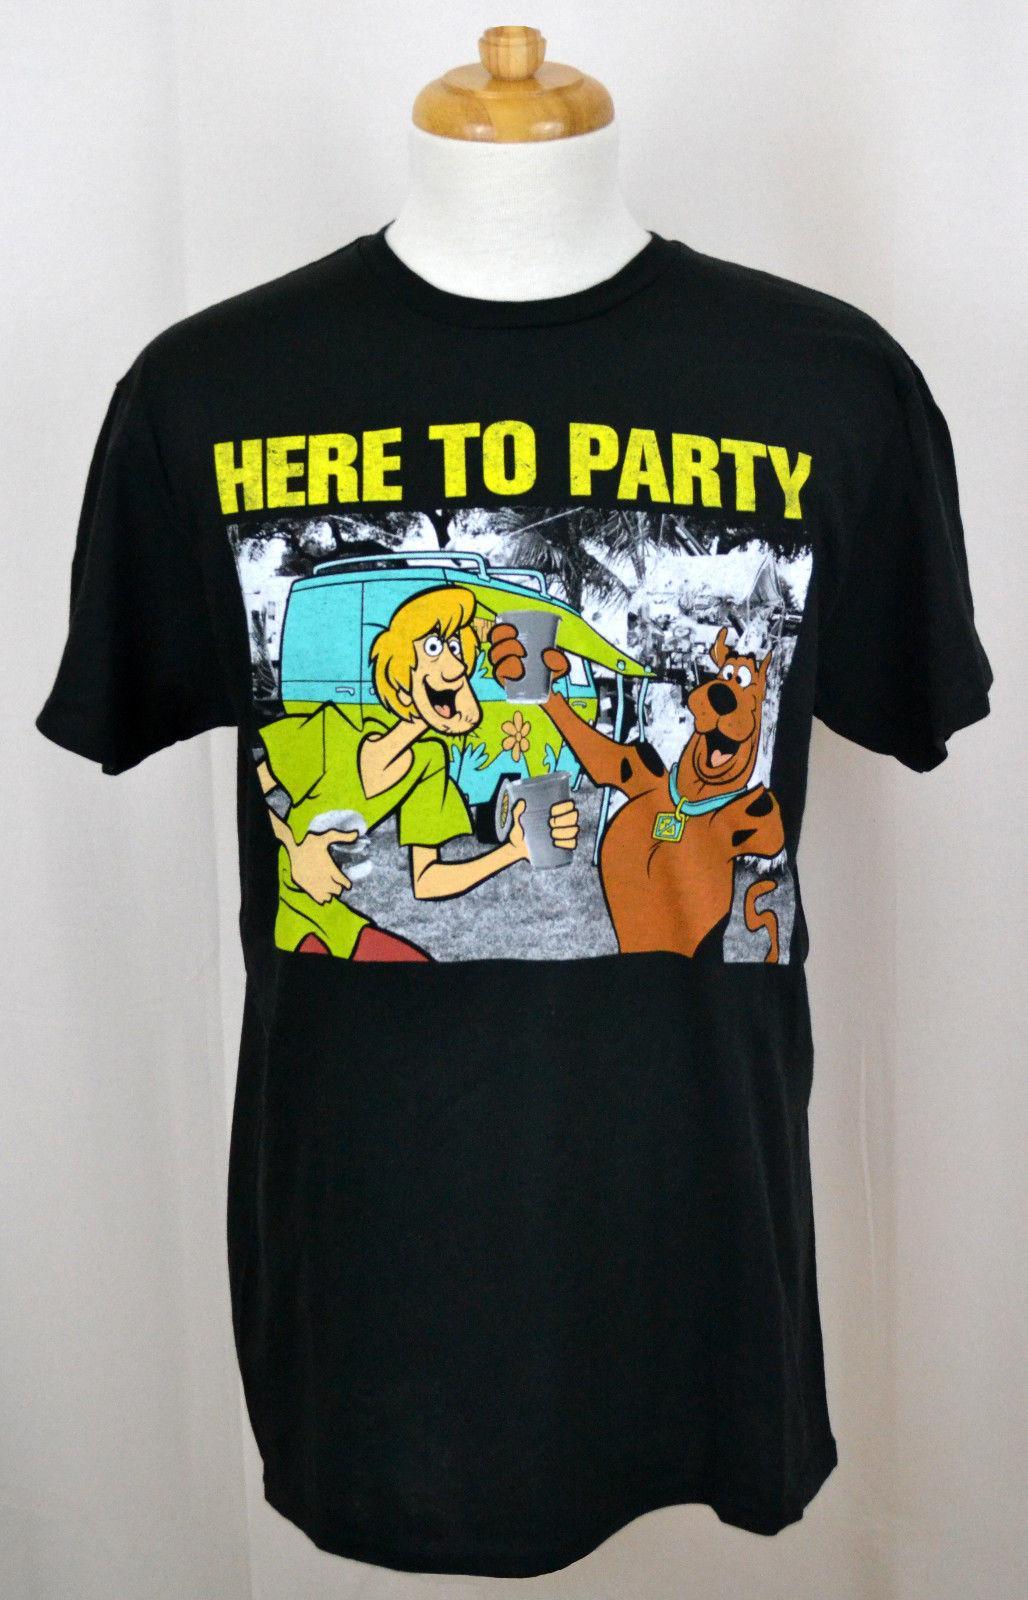 Scooby Doo Short-Sleeve T Shirts Comfort Crew Neck Soft 100/% Cotton Tees